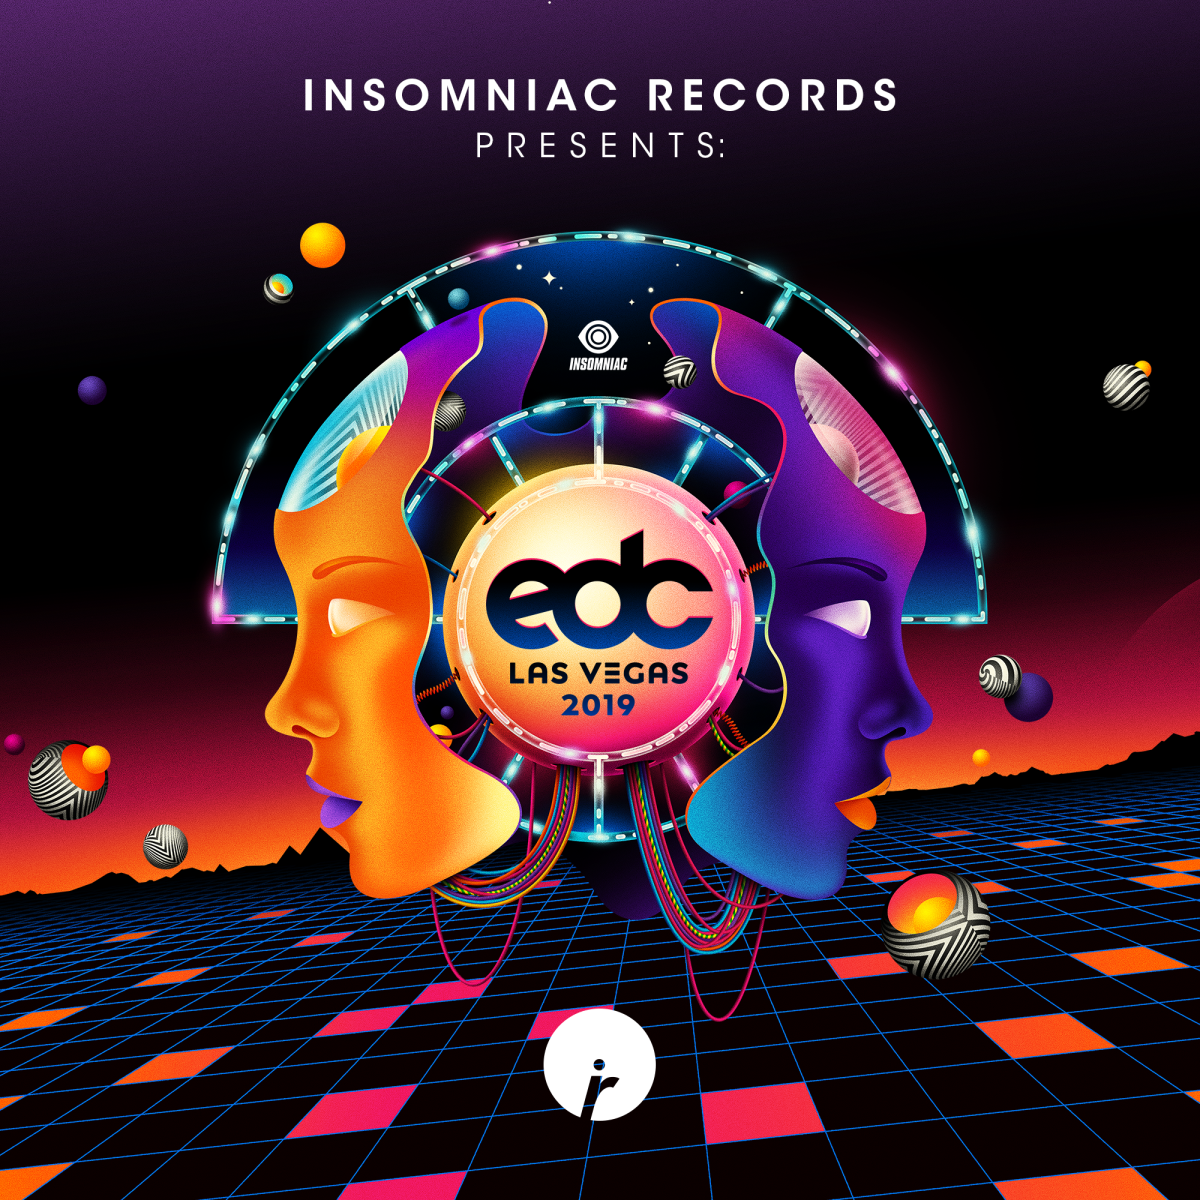 edc_las_vegas_2019_misc_insomniac_records_compilation_artwork_1400x1400_r01